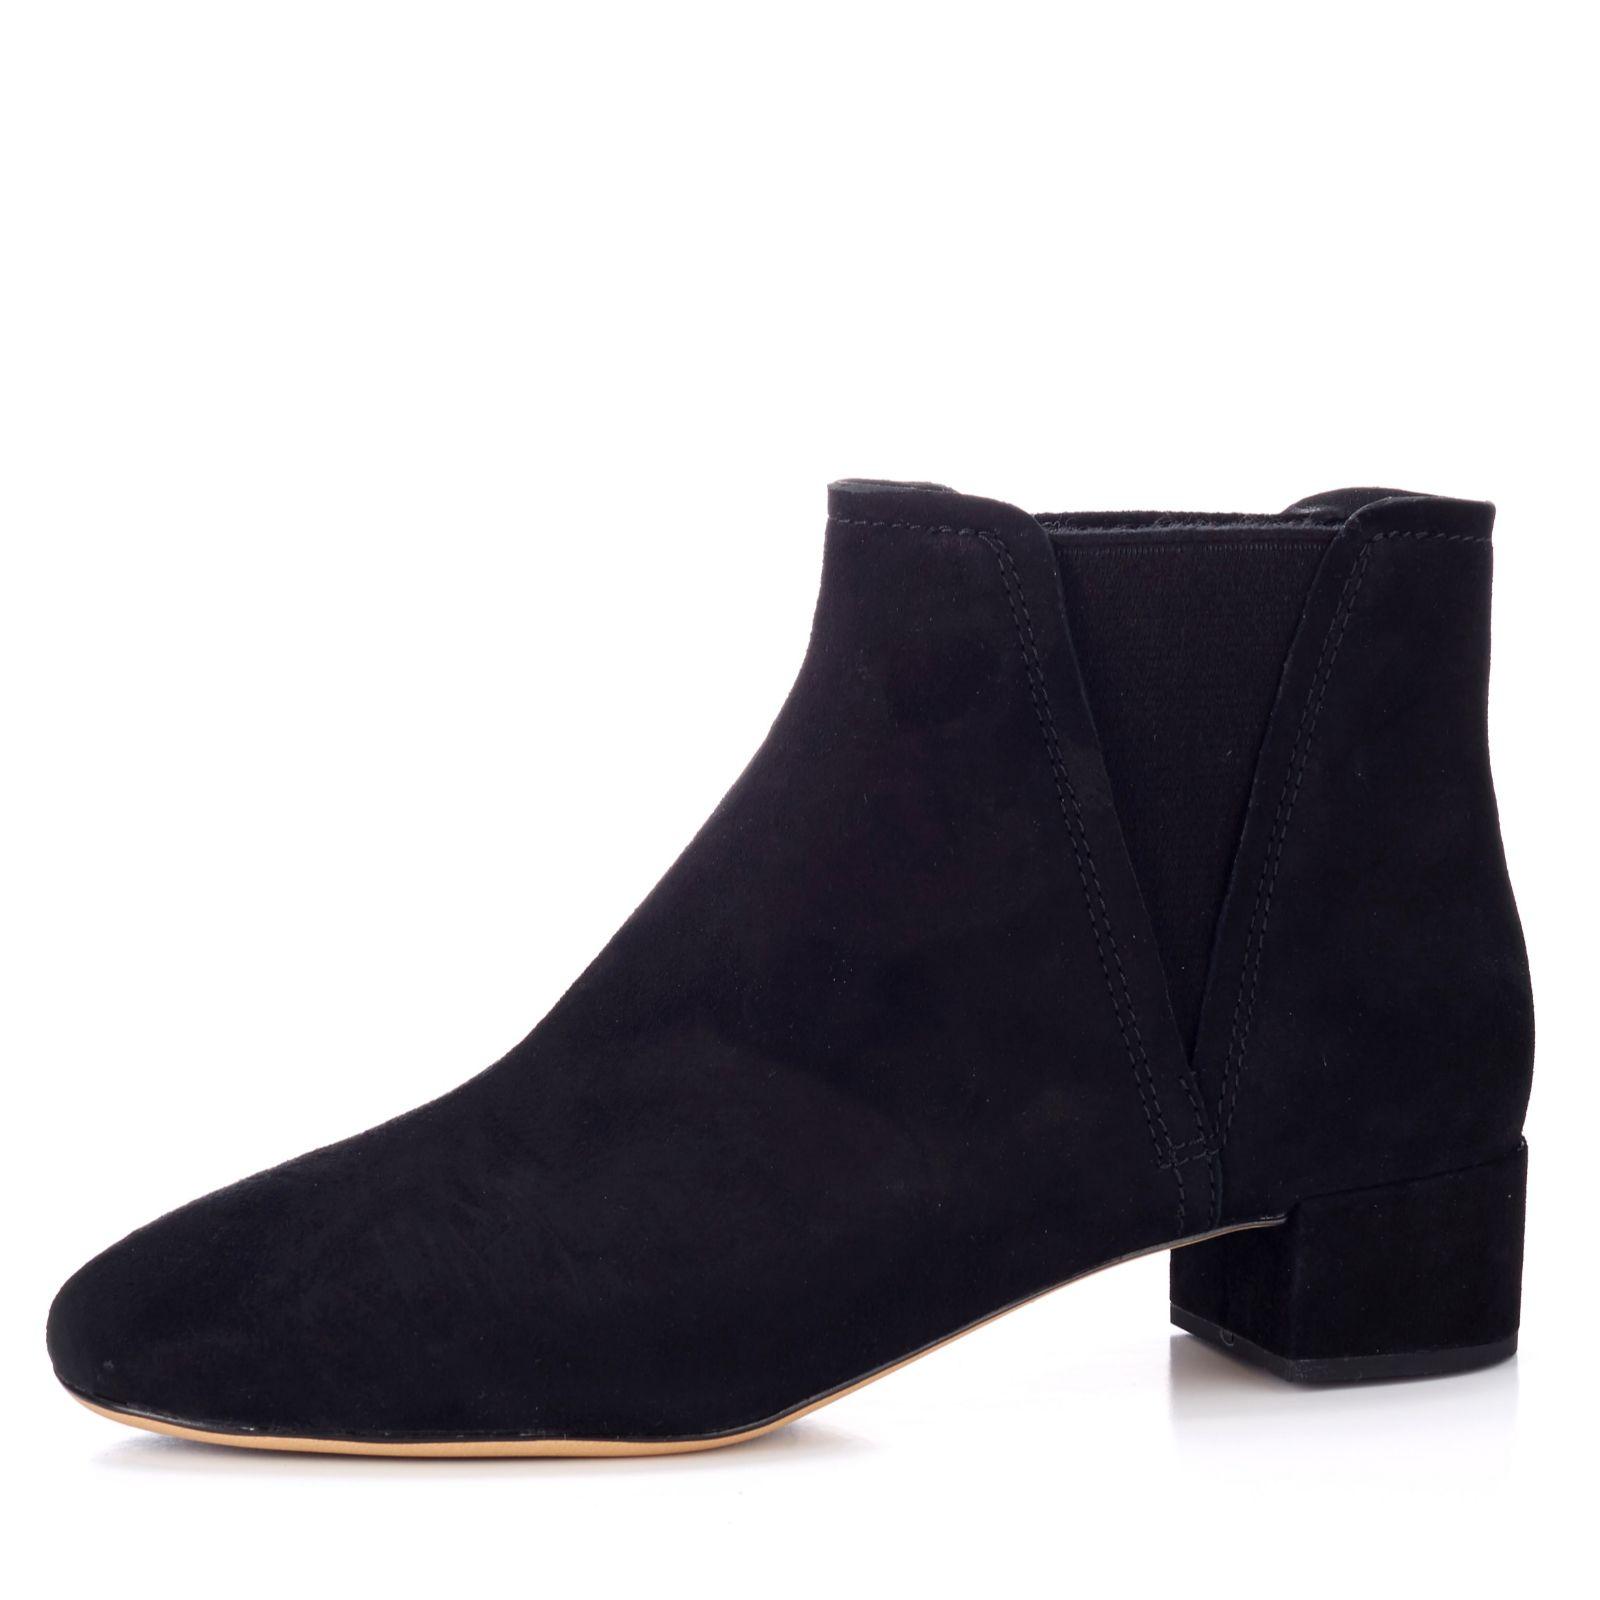 b65e070e1c9 Clarks Orabella Ruby Block Heel Chelsea Boot Standard Fit - QVC UK